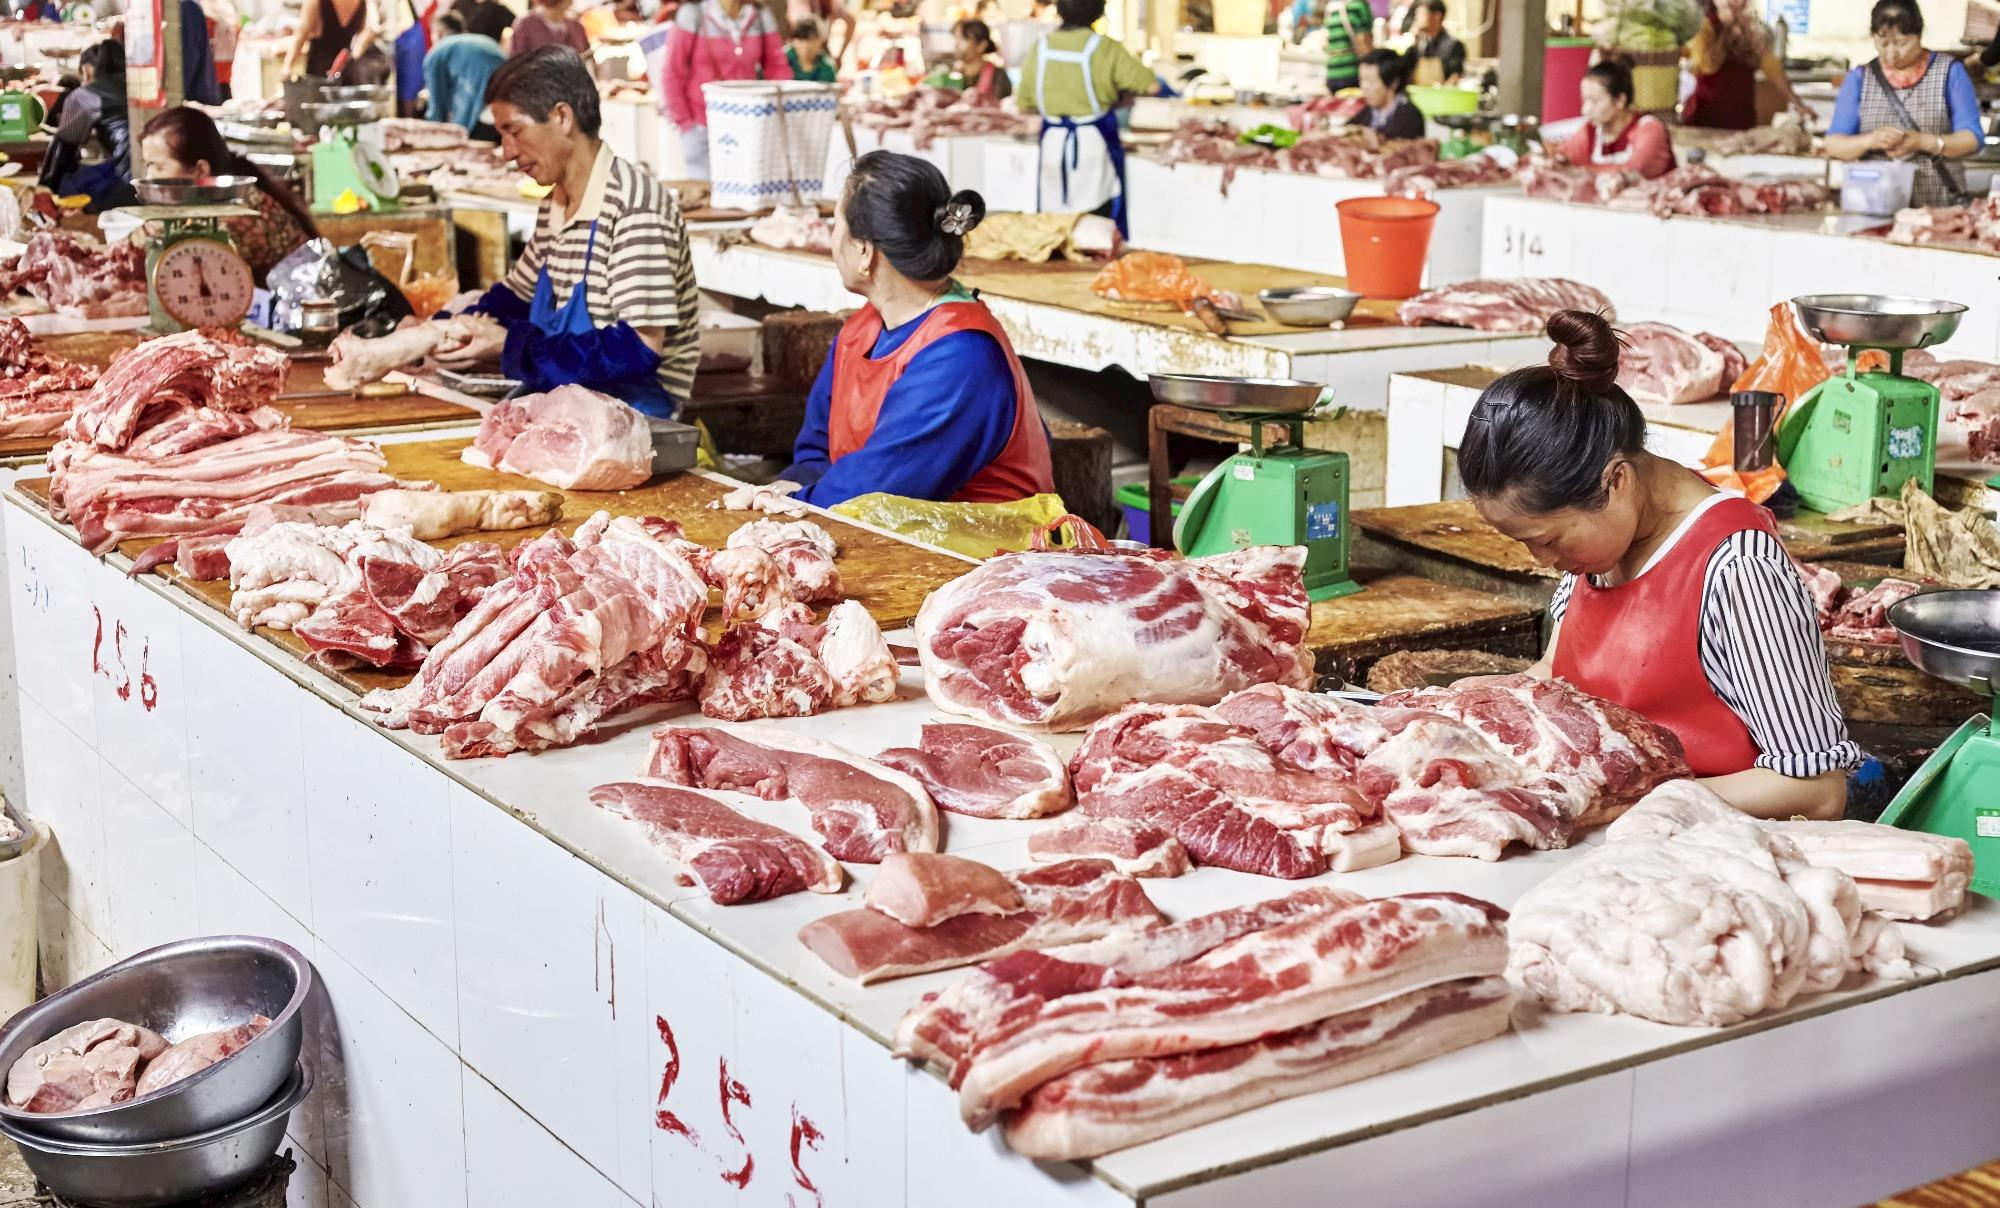 Consumo de carne suína na China deve cair entre 10 e 15%, estima Rabobank